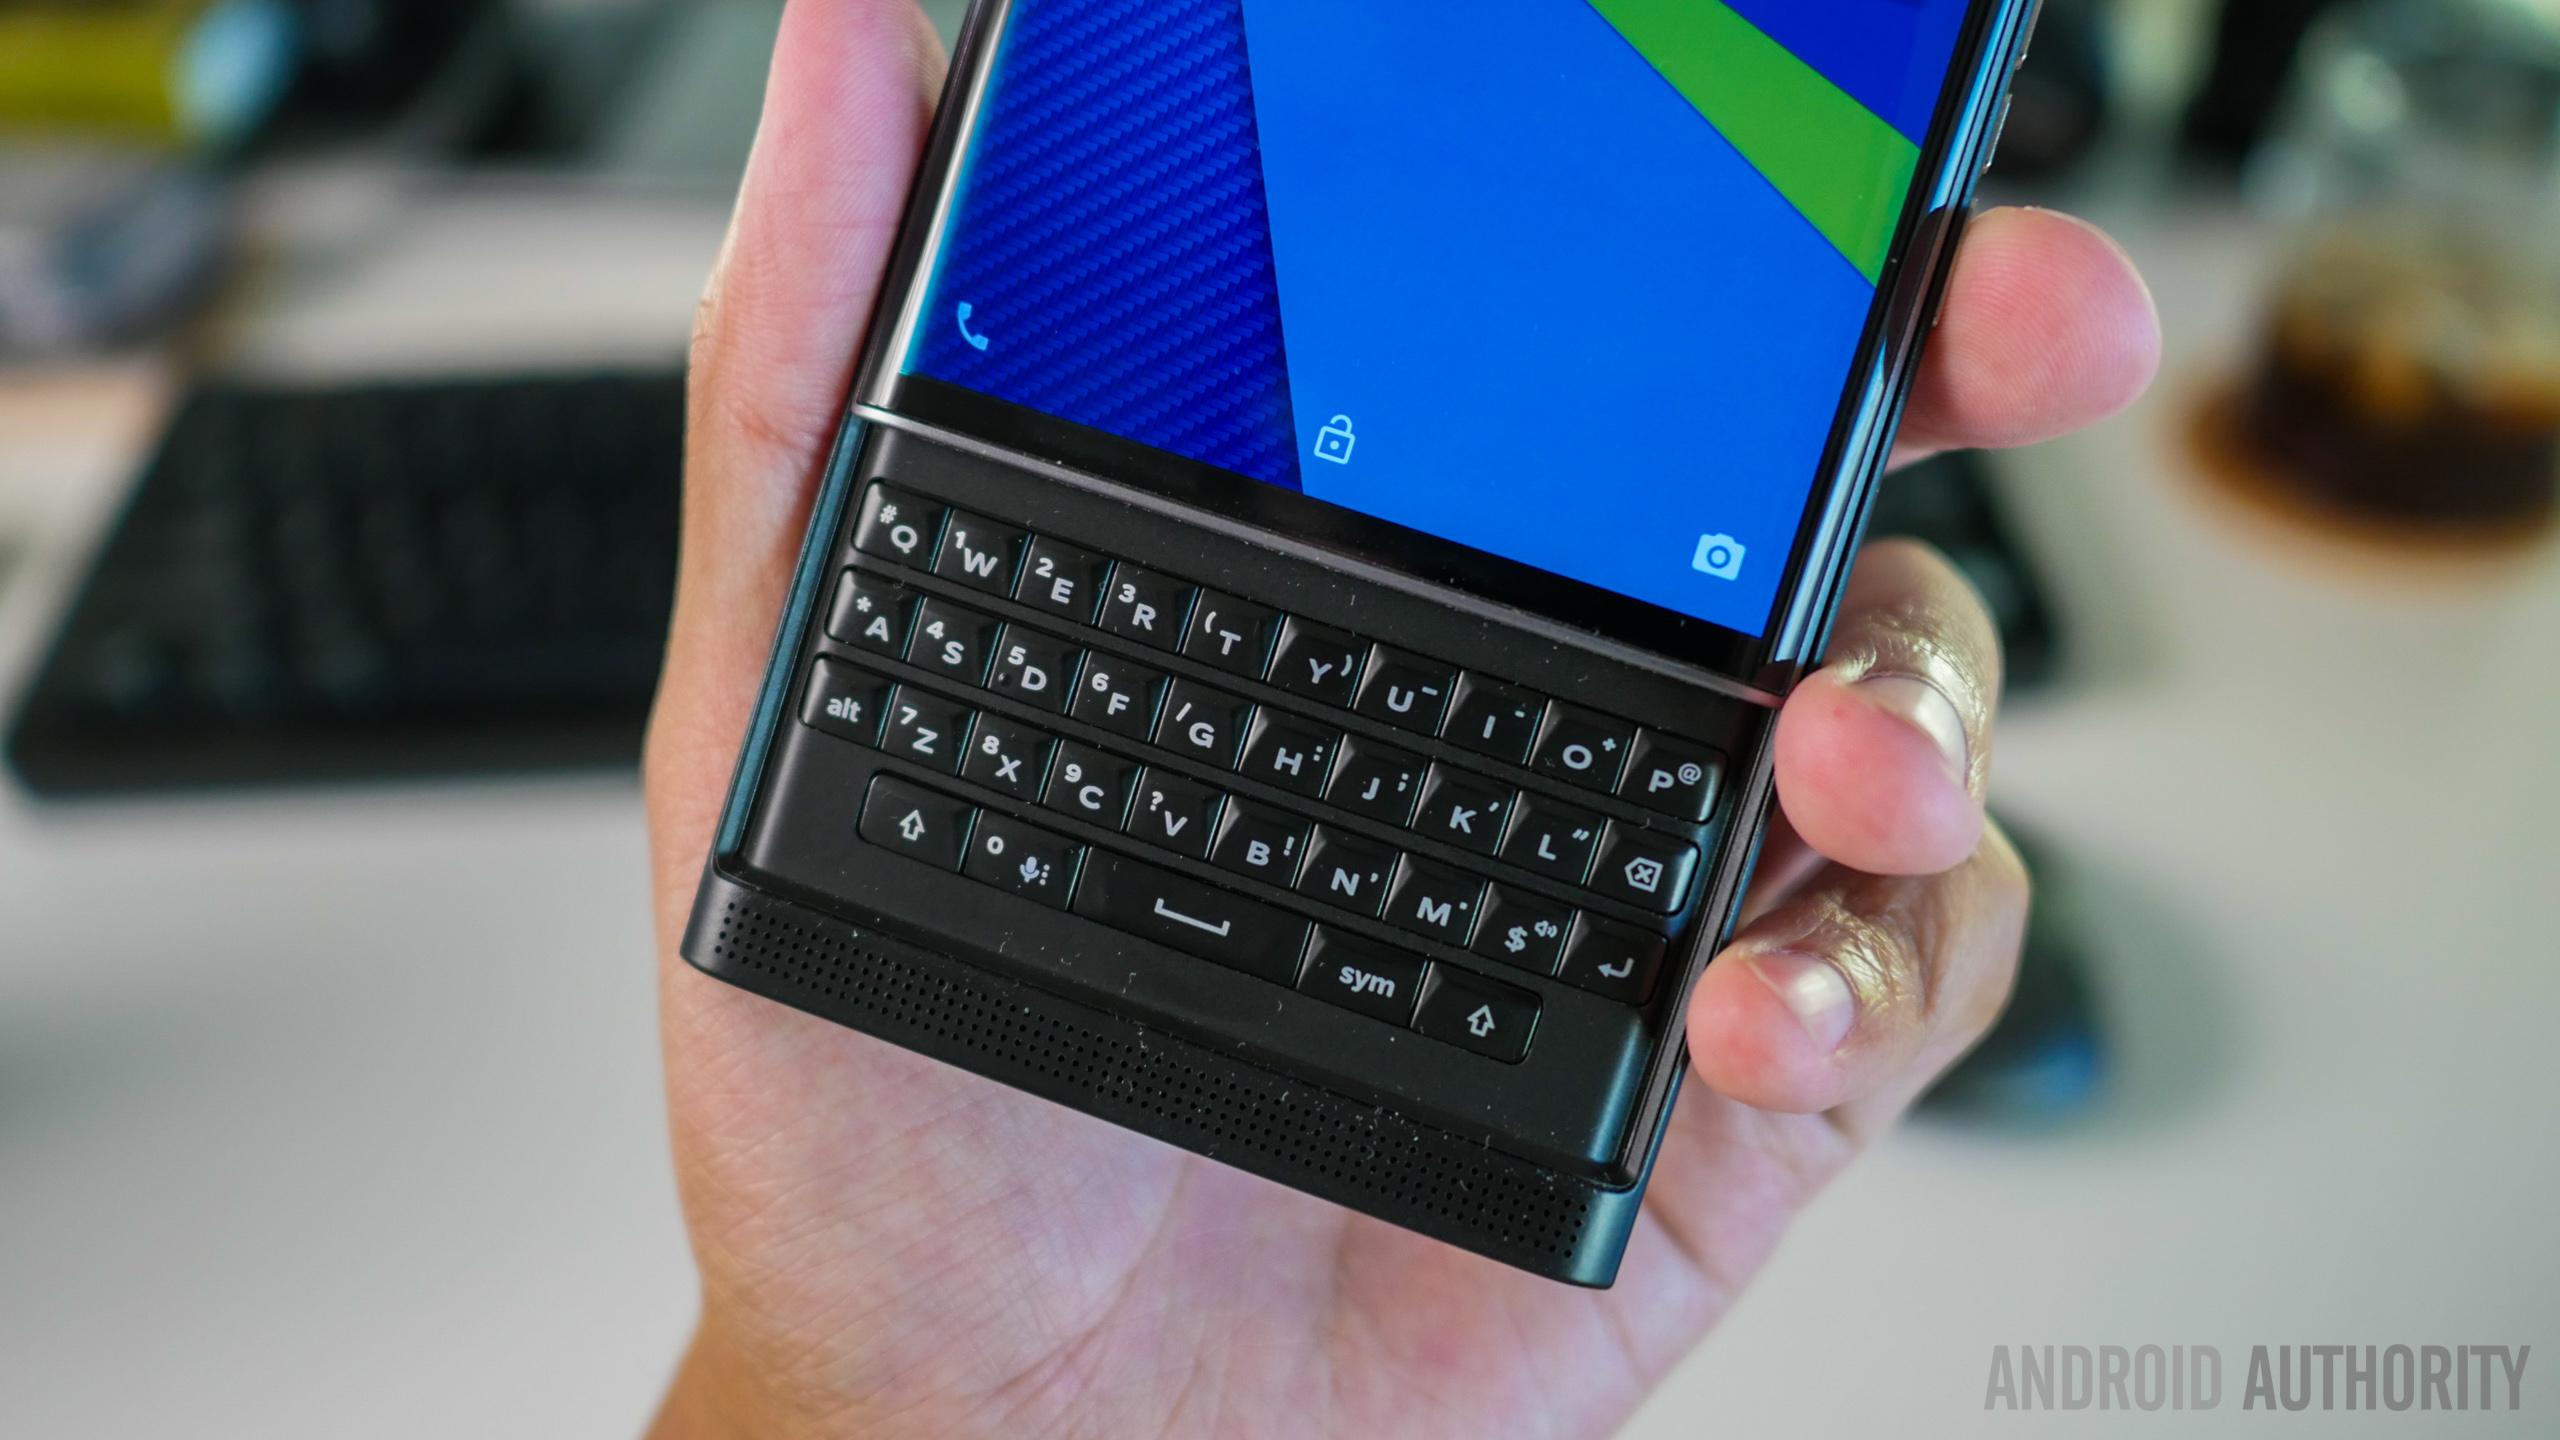 BlackBerry sold under 50,000 Priv units, Play Store data ...